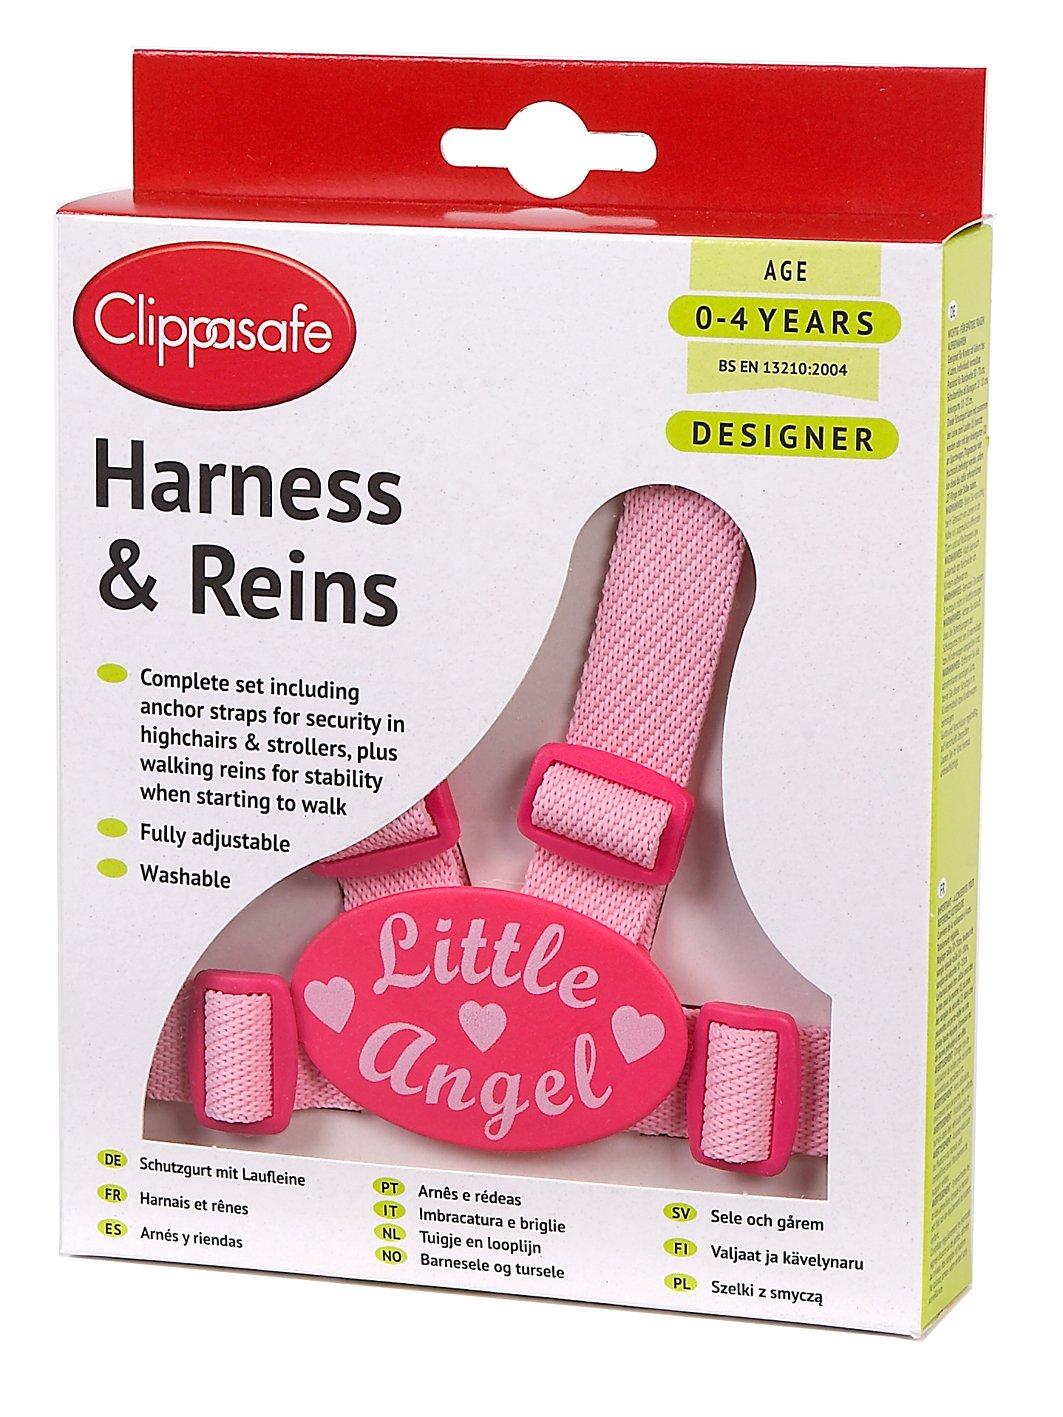 Clippasafe Easy Wash Harness & Reins (Little Angel) Clippasafe Ltd CL036 Baby Stroller